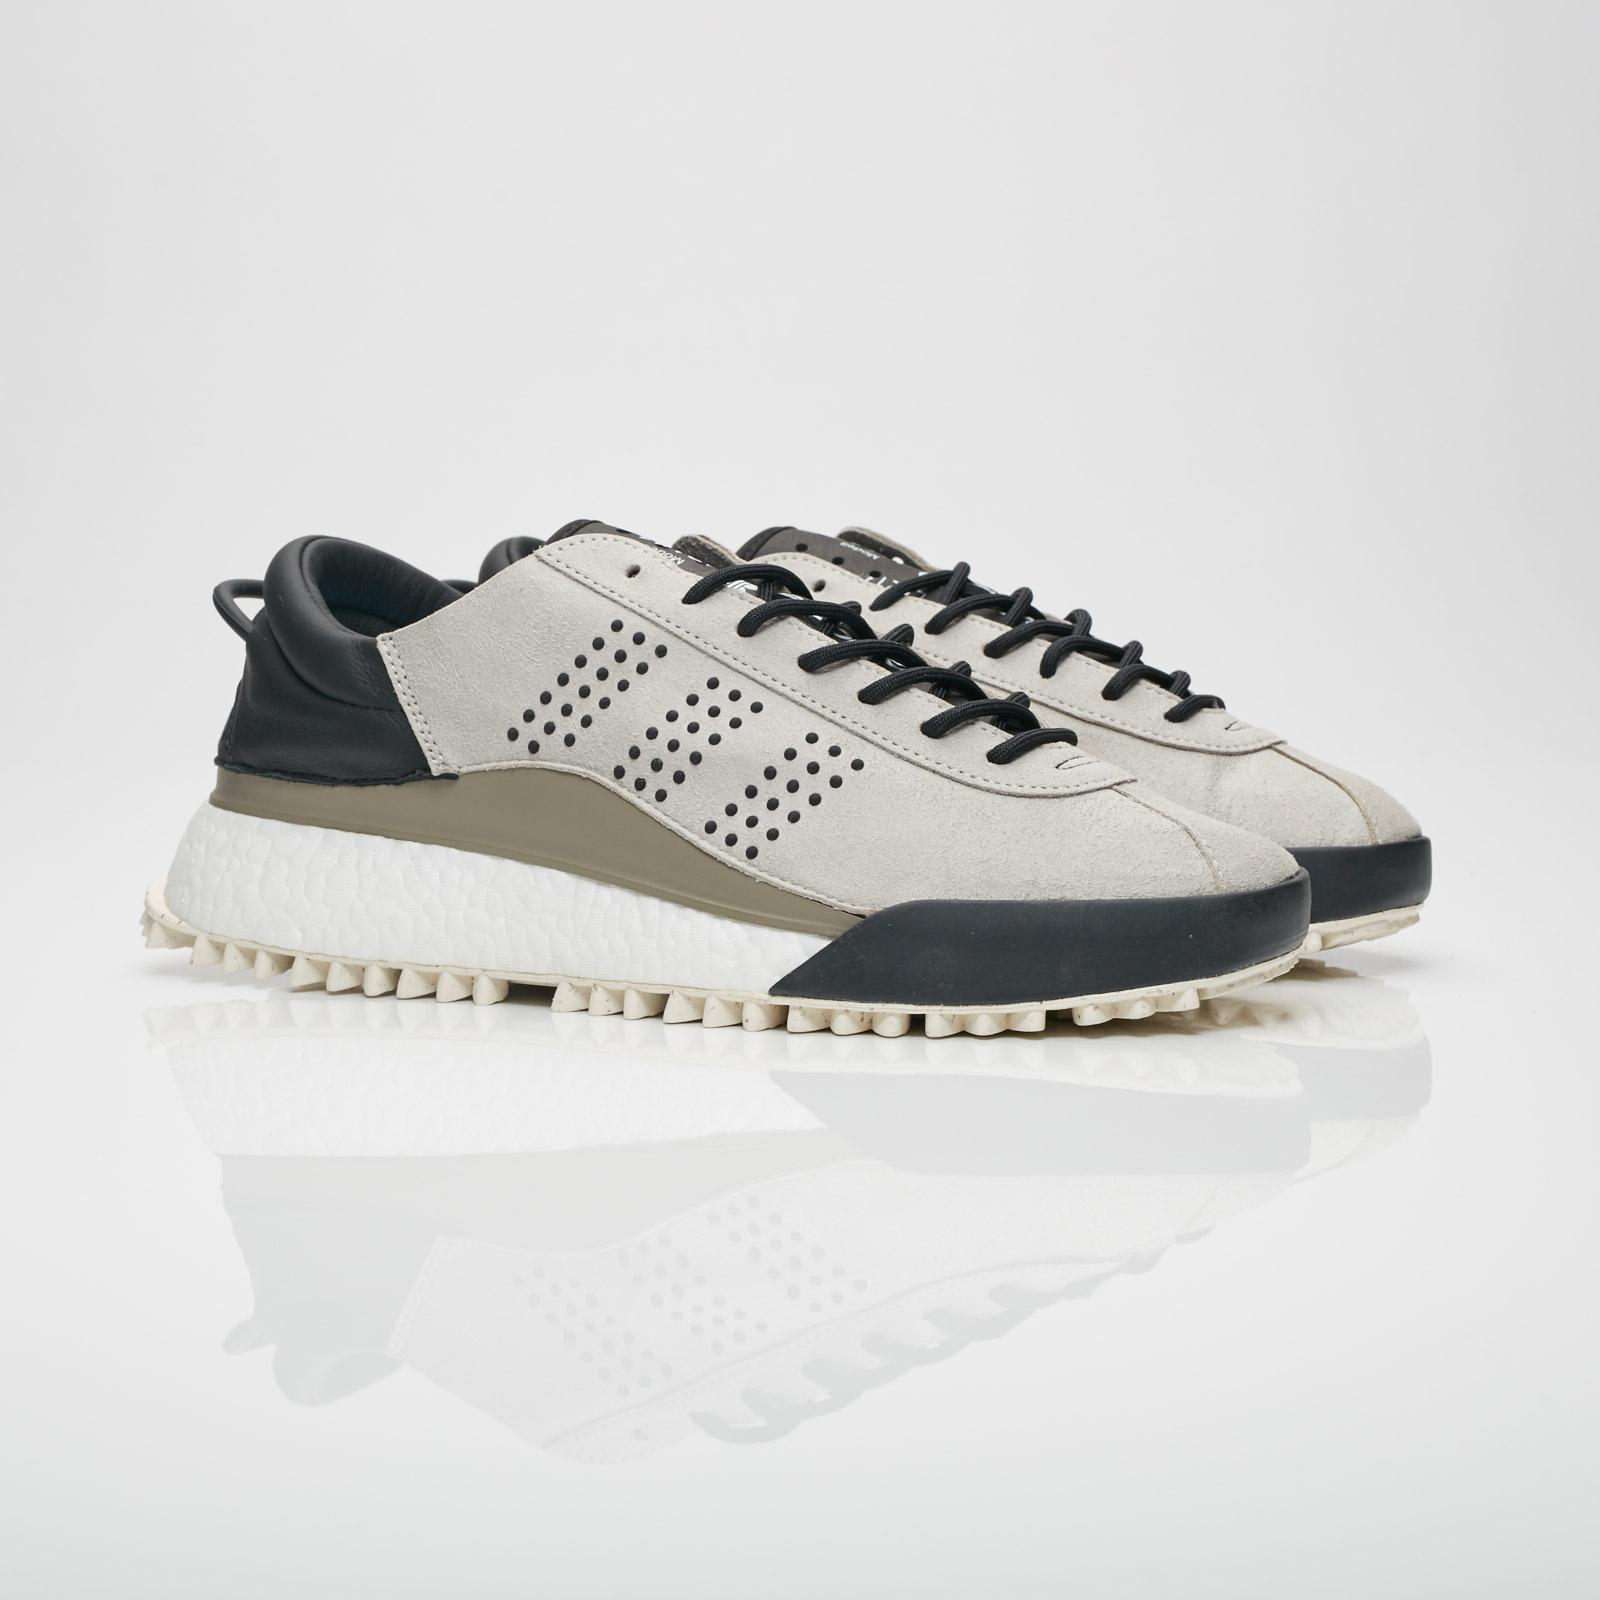 adidas Hike Low Shoes - Ac6842